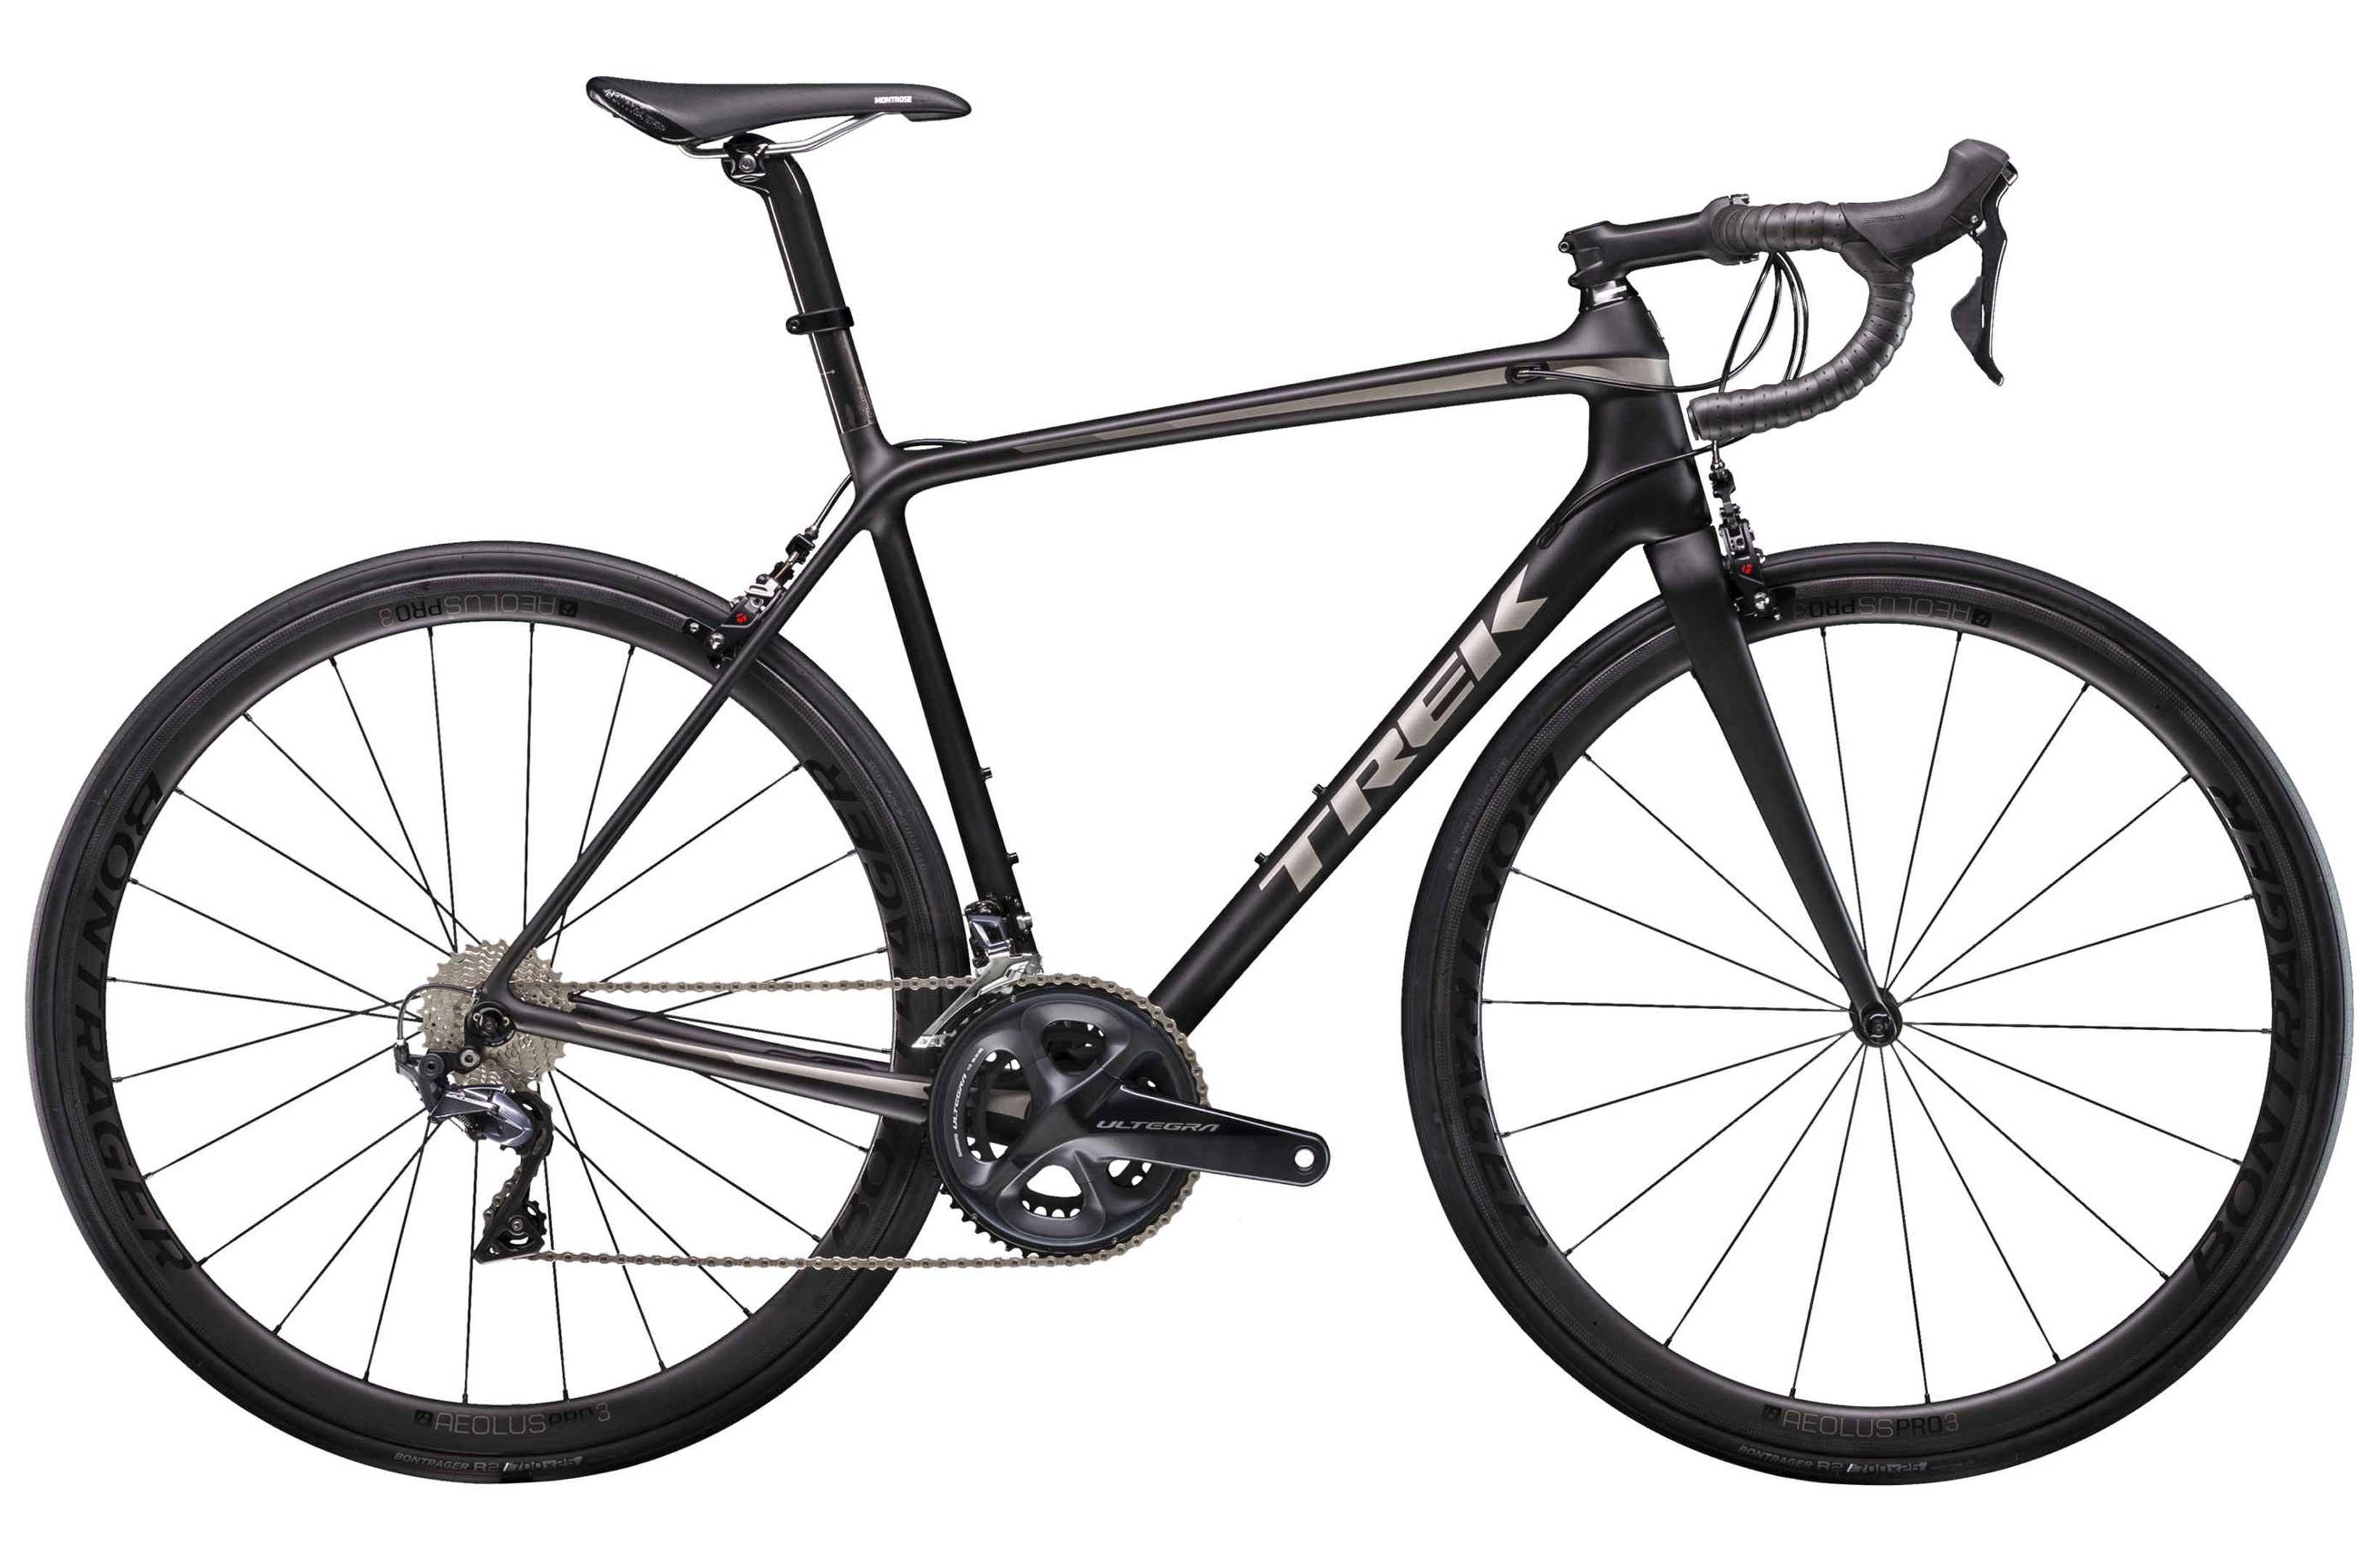 Trek Emonda SL 6 Pro 2019 Road Bike (Black, 52cm)